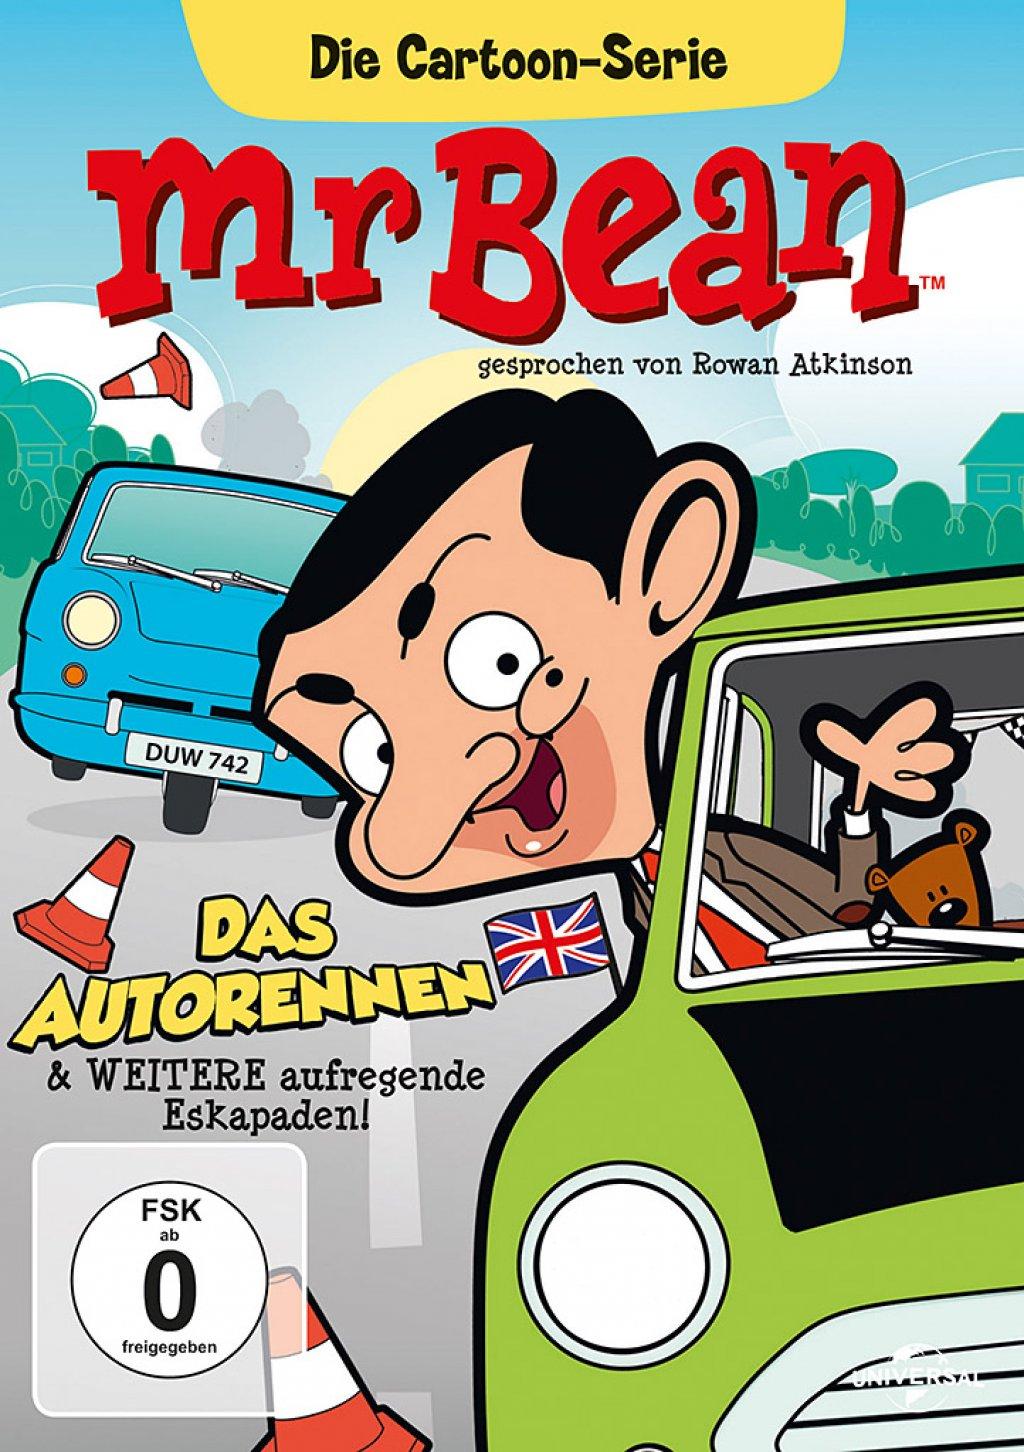 Mr. Bean - Die Cartoon Serie - Staffel 2 / Vol. 3 (DVD)